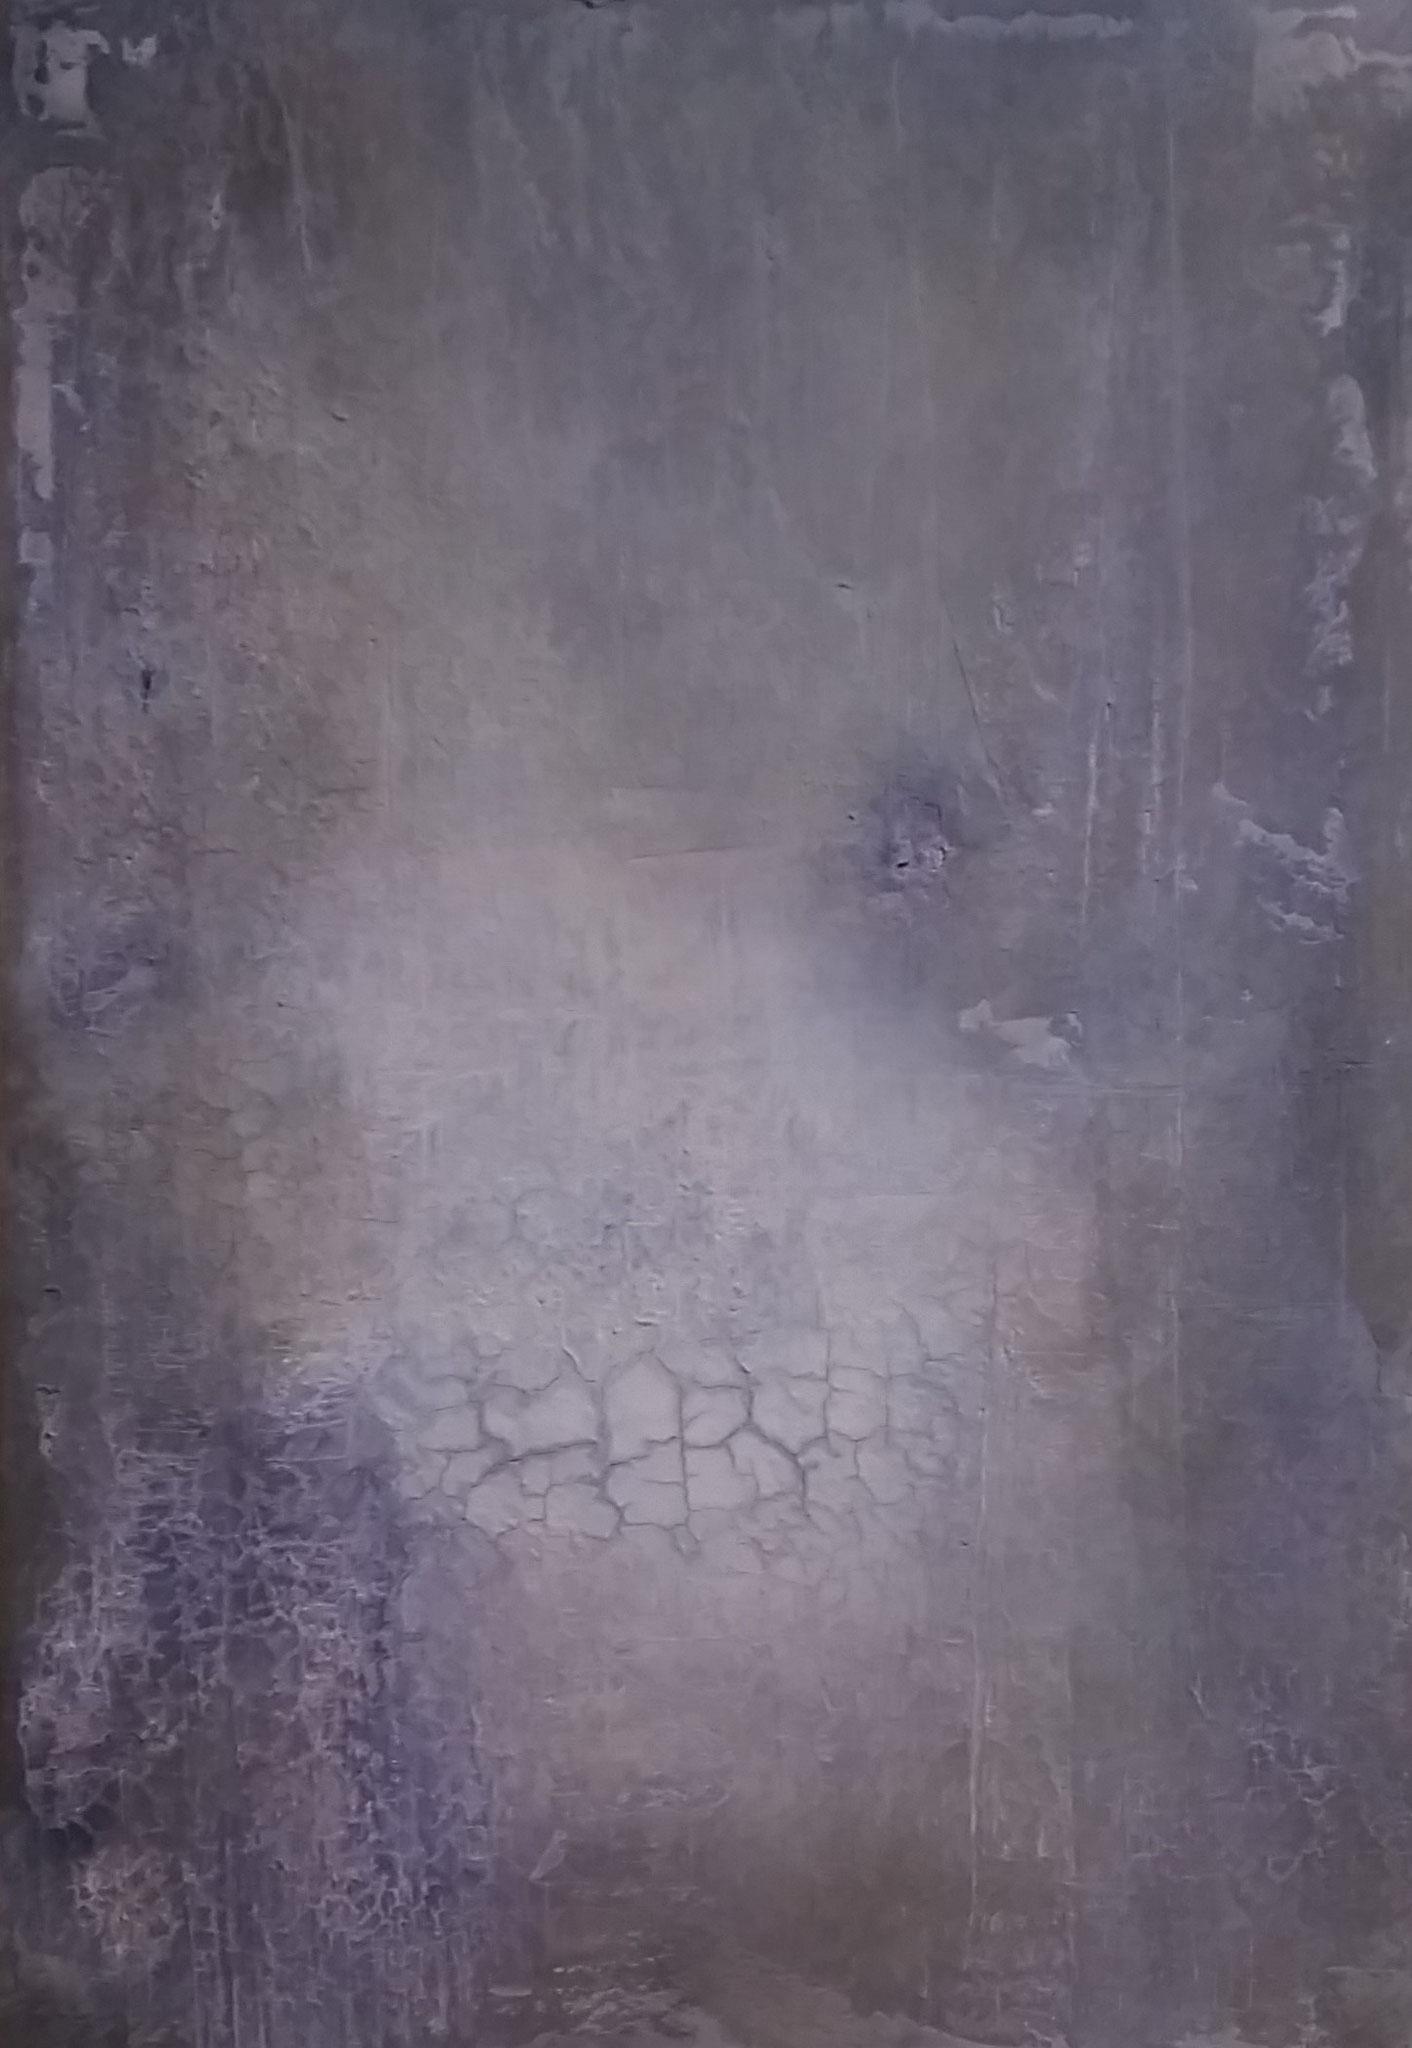 o.T. 70x100 Marmormehl, Öl, Pigmente